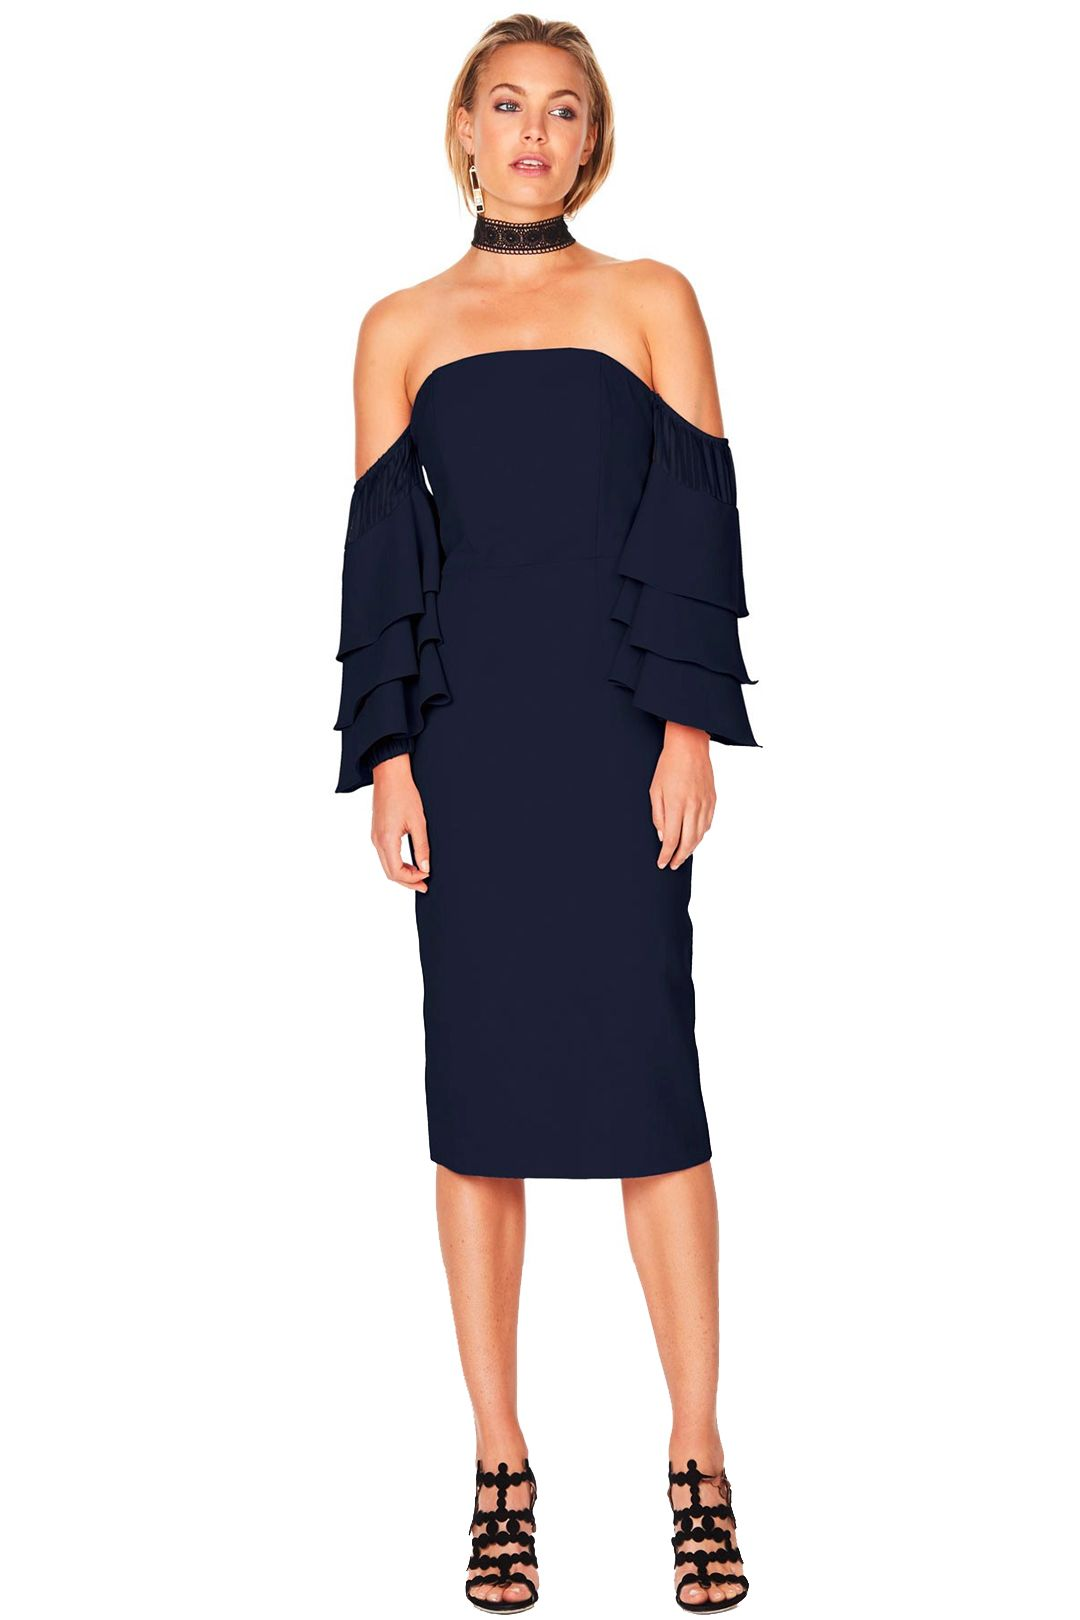 Talulah - Sunday Ruffle Dress - Navy - Front